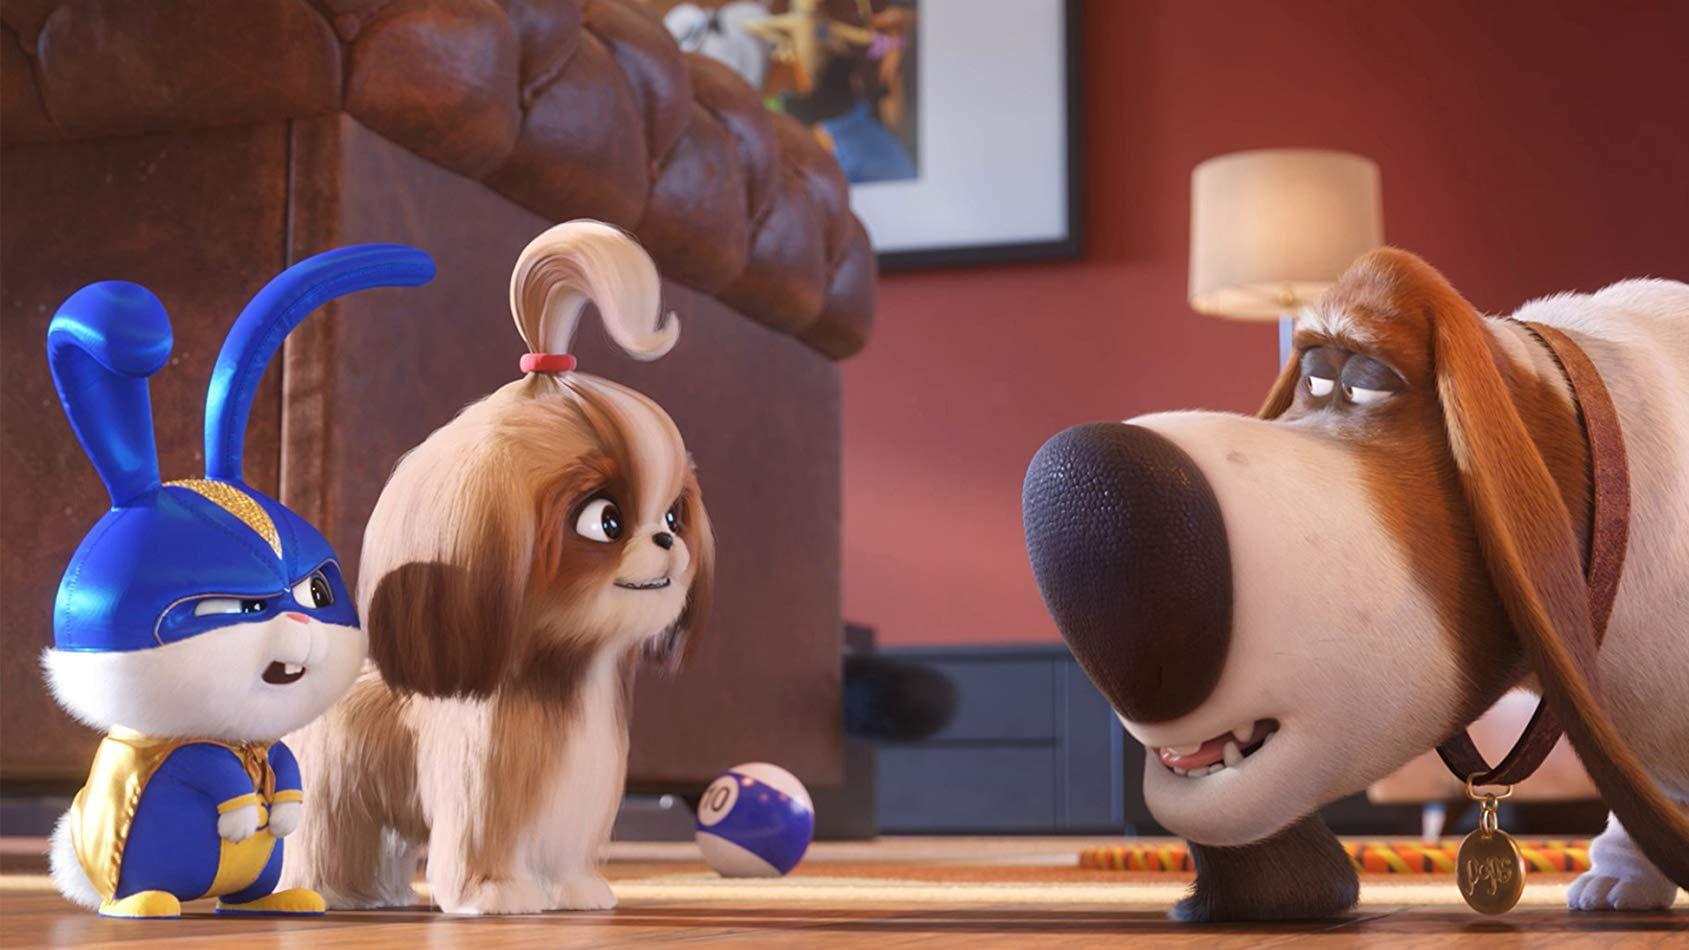 Sehen Pets 2 2019 Ganzer Film Deutsch Komplett Kino Pets 2